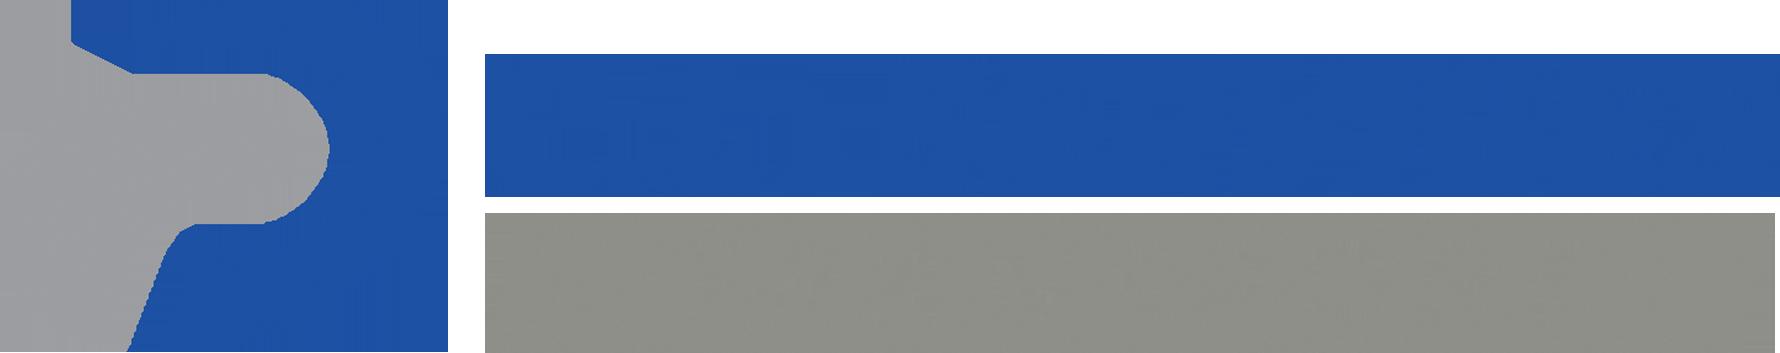 CL Services Transport